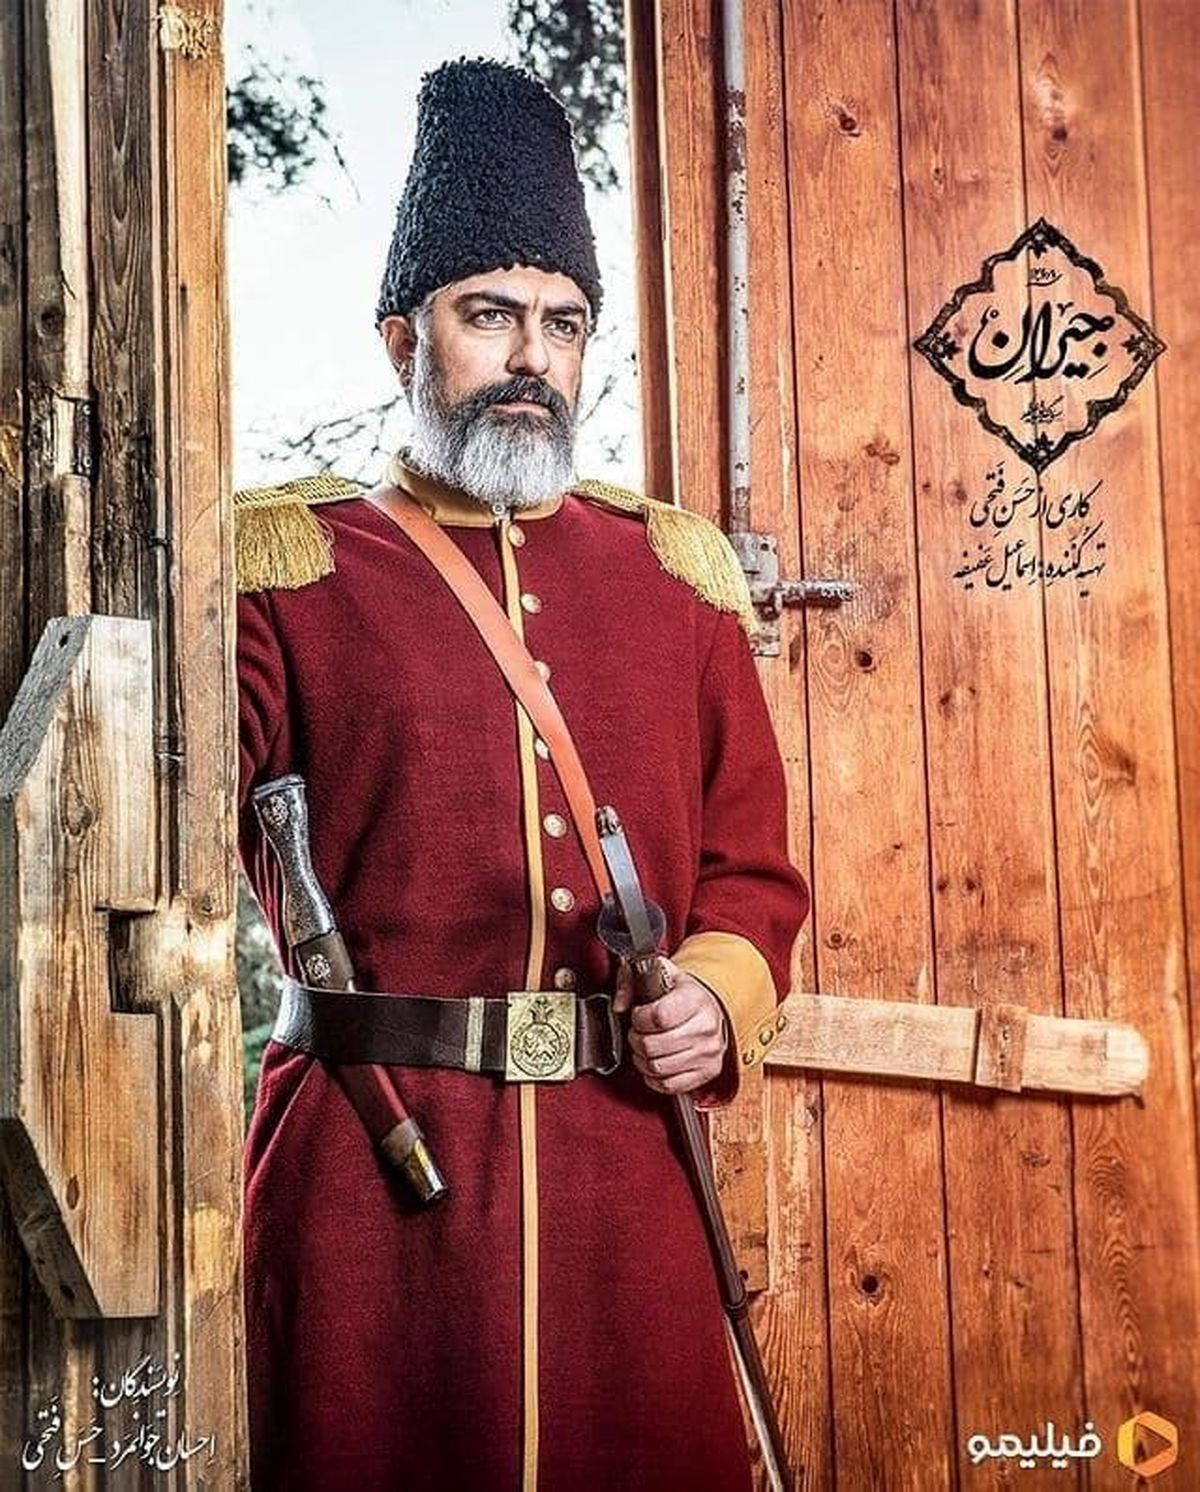 تیپ و چهره متفاوت مهدی پاکدل در سریال «جیران» /عکس